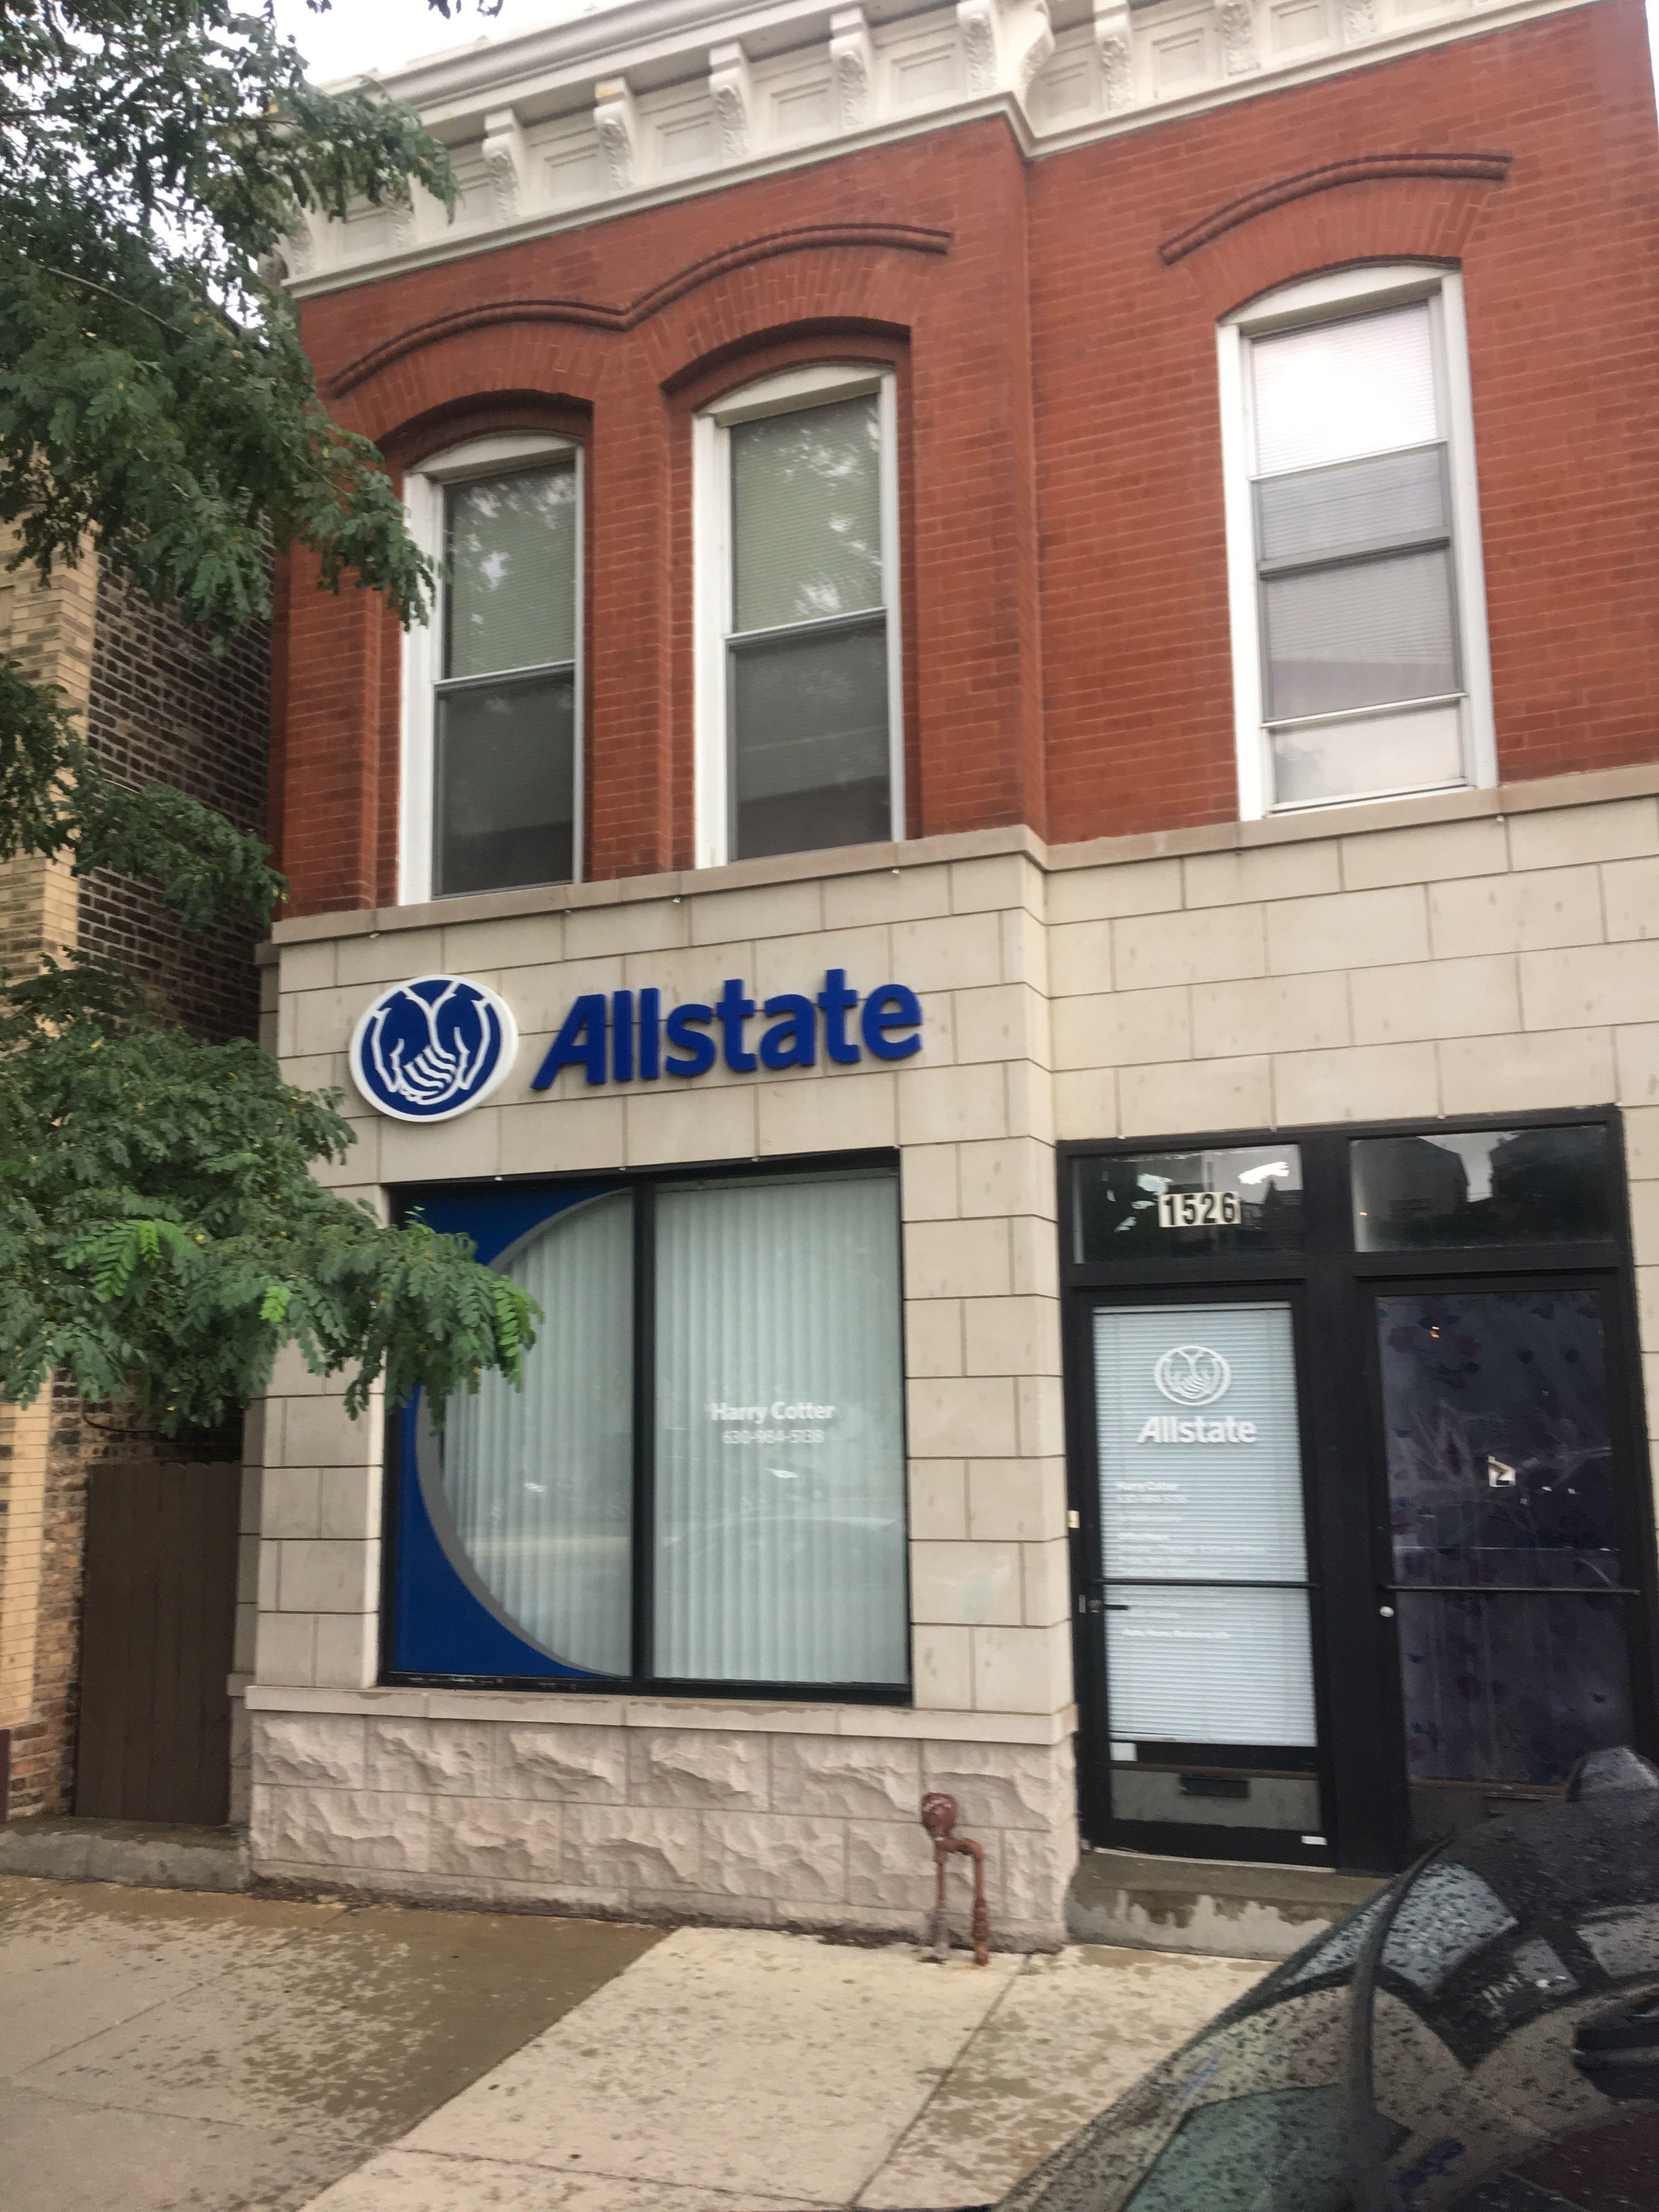 Allstate Insurance Agent: Harry Cotter